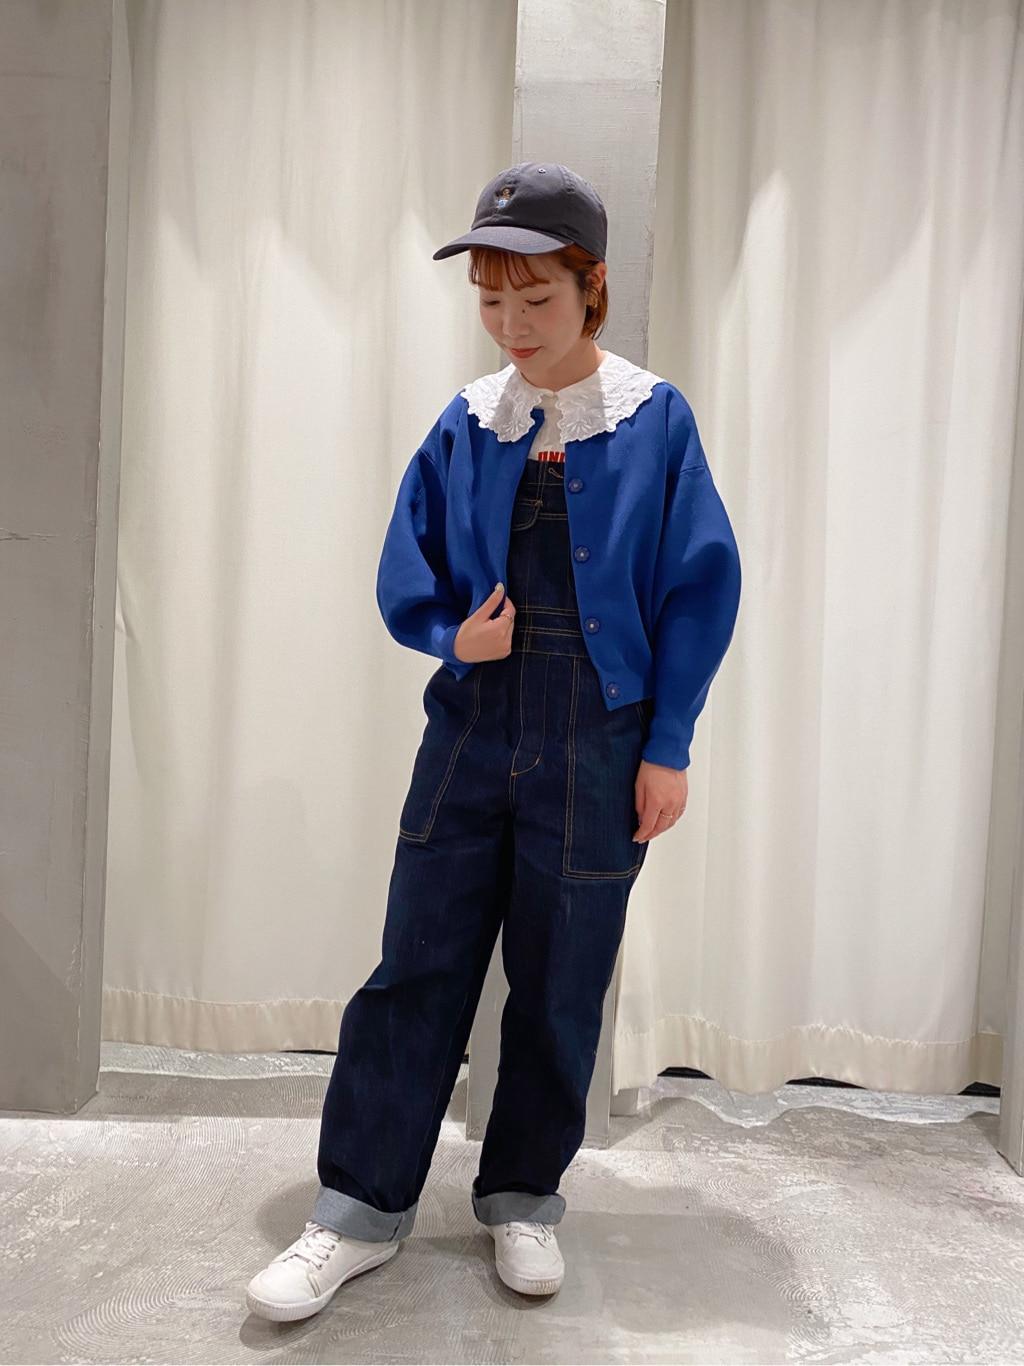 AMB SHOP CHILD WOMAN CHILD WOMAN , PAR ICI ルミネ横浜 身長:153cm 2020.07.28